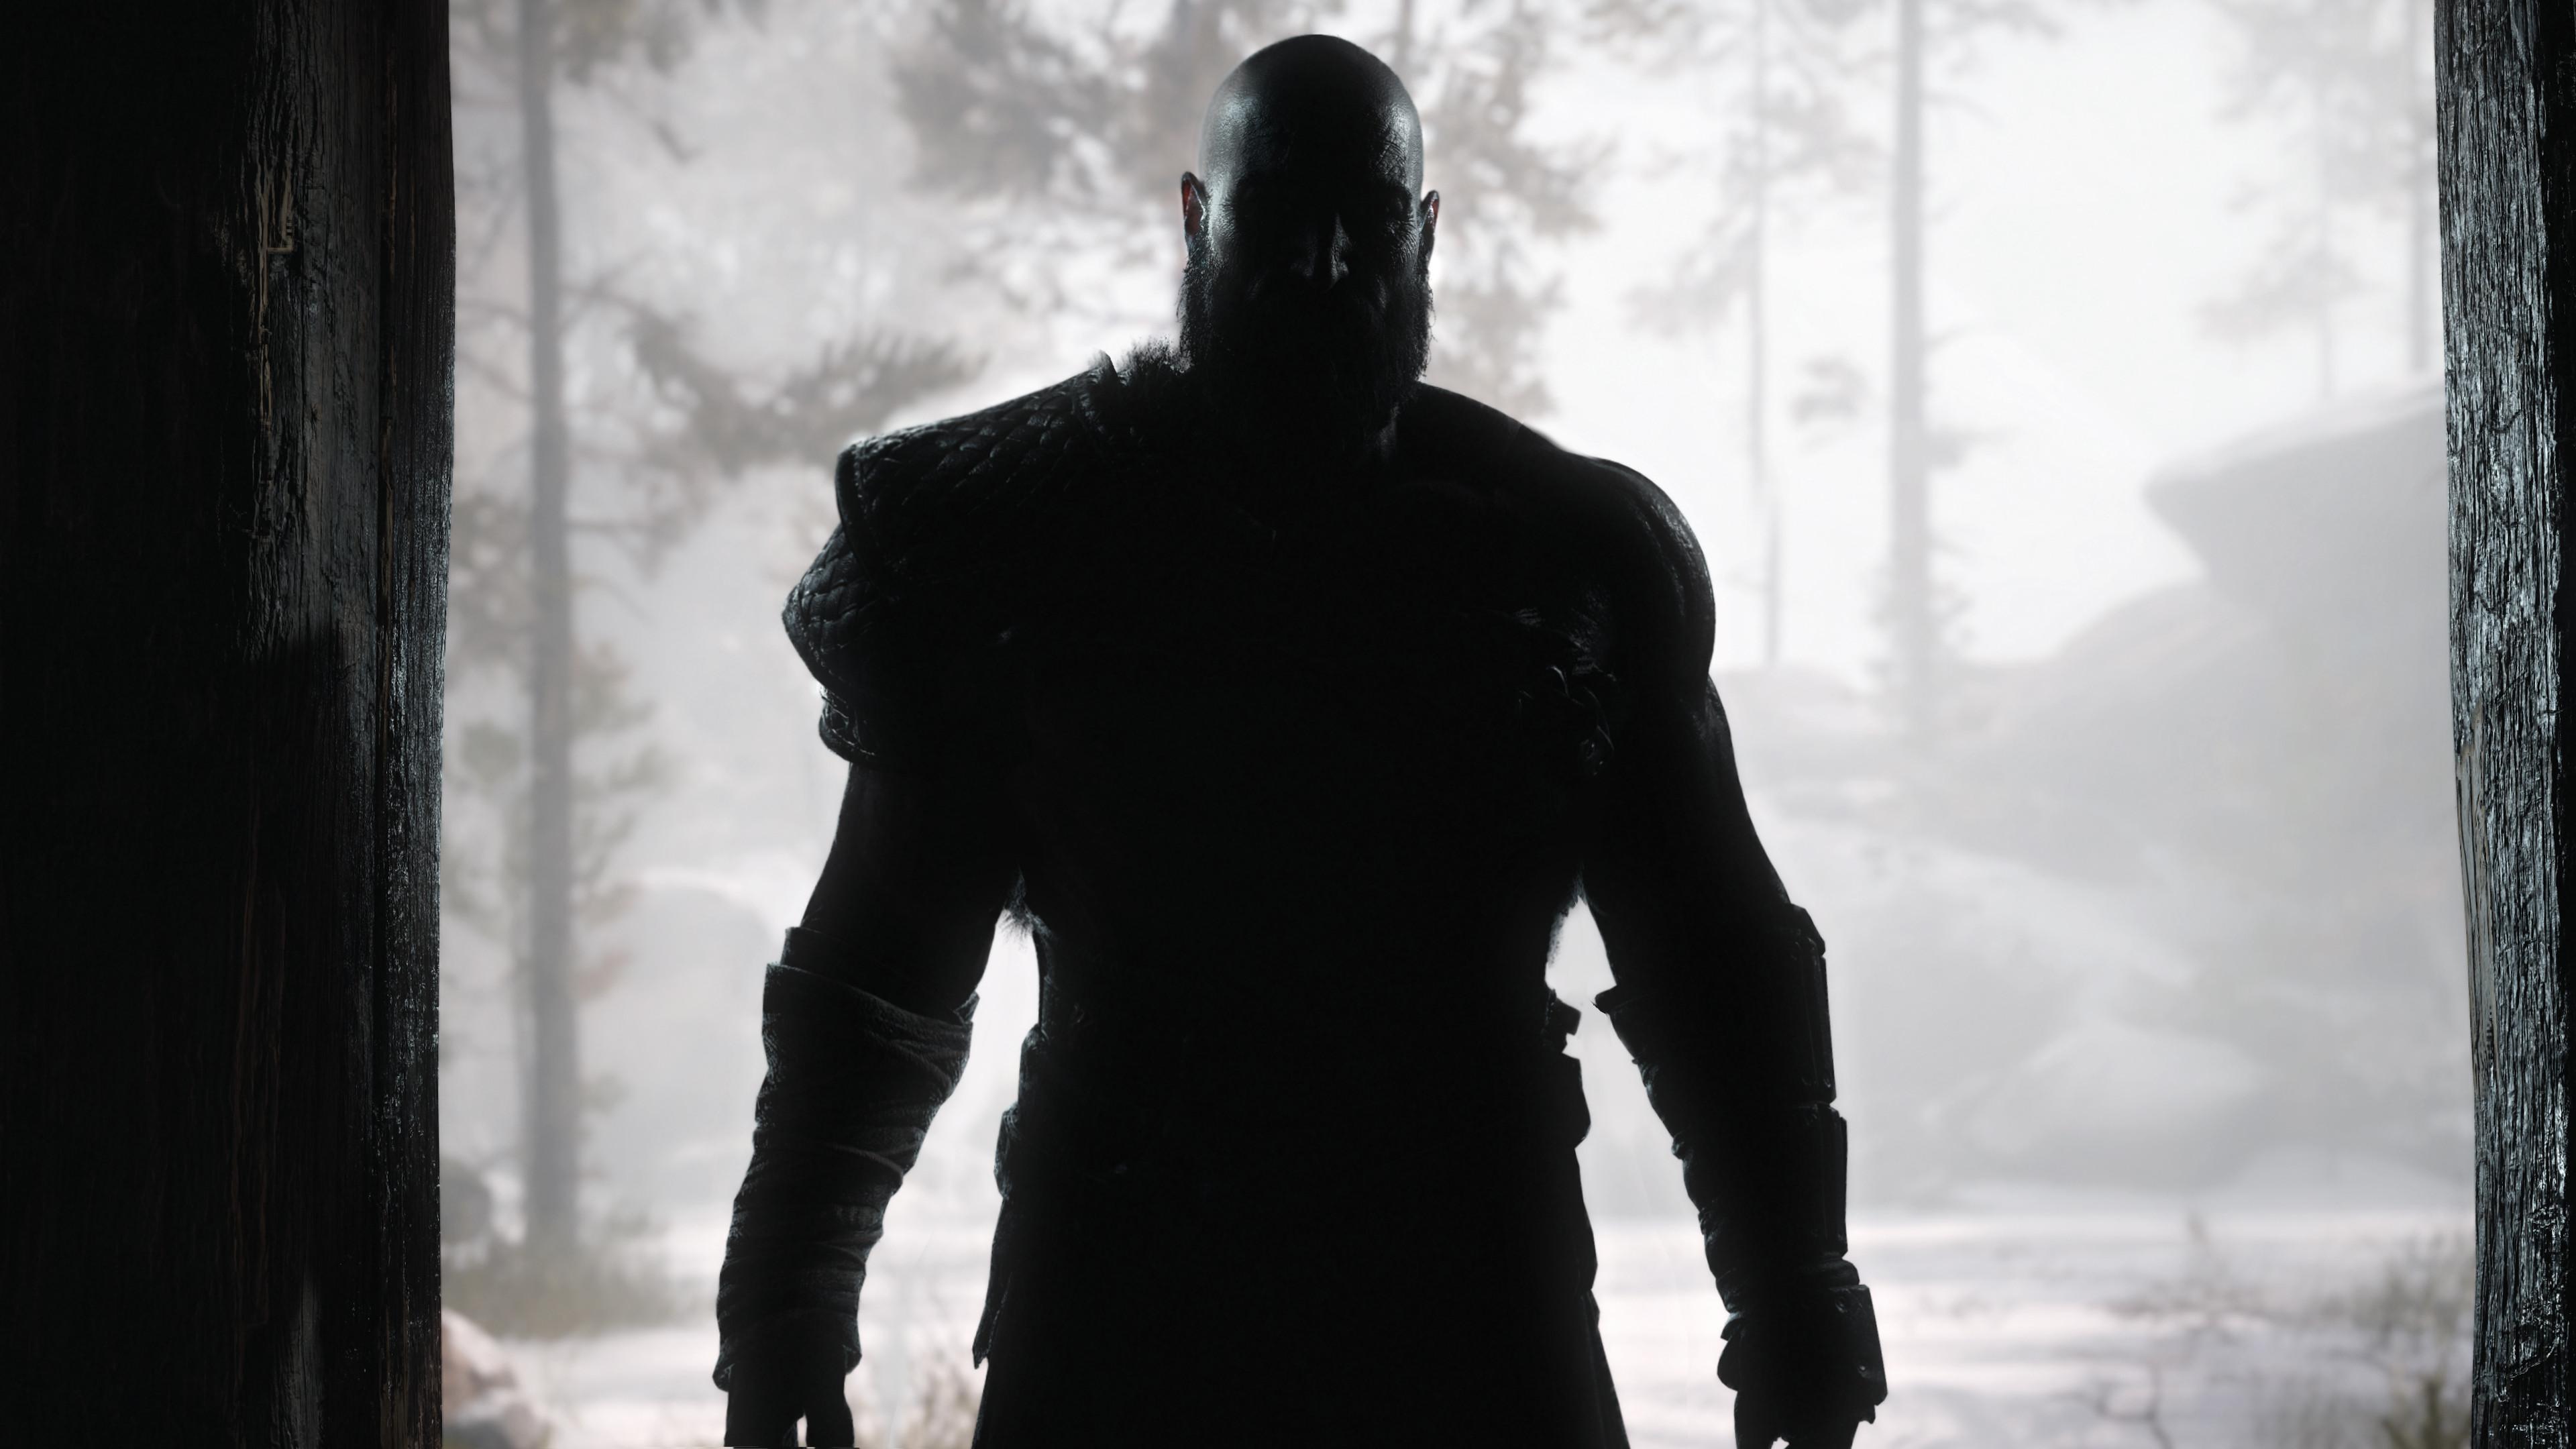 1400x900 Kratos God Of War 4k 1400x900 Resolution Hd 4k